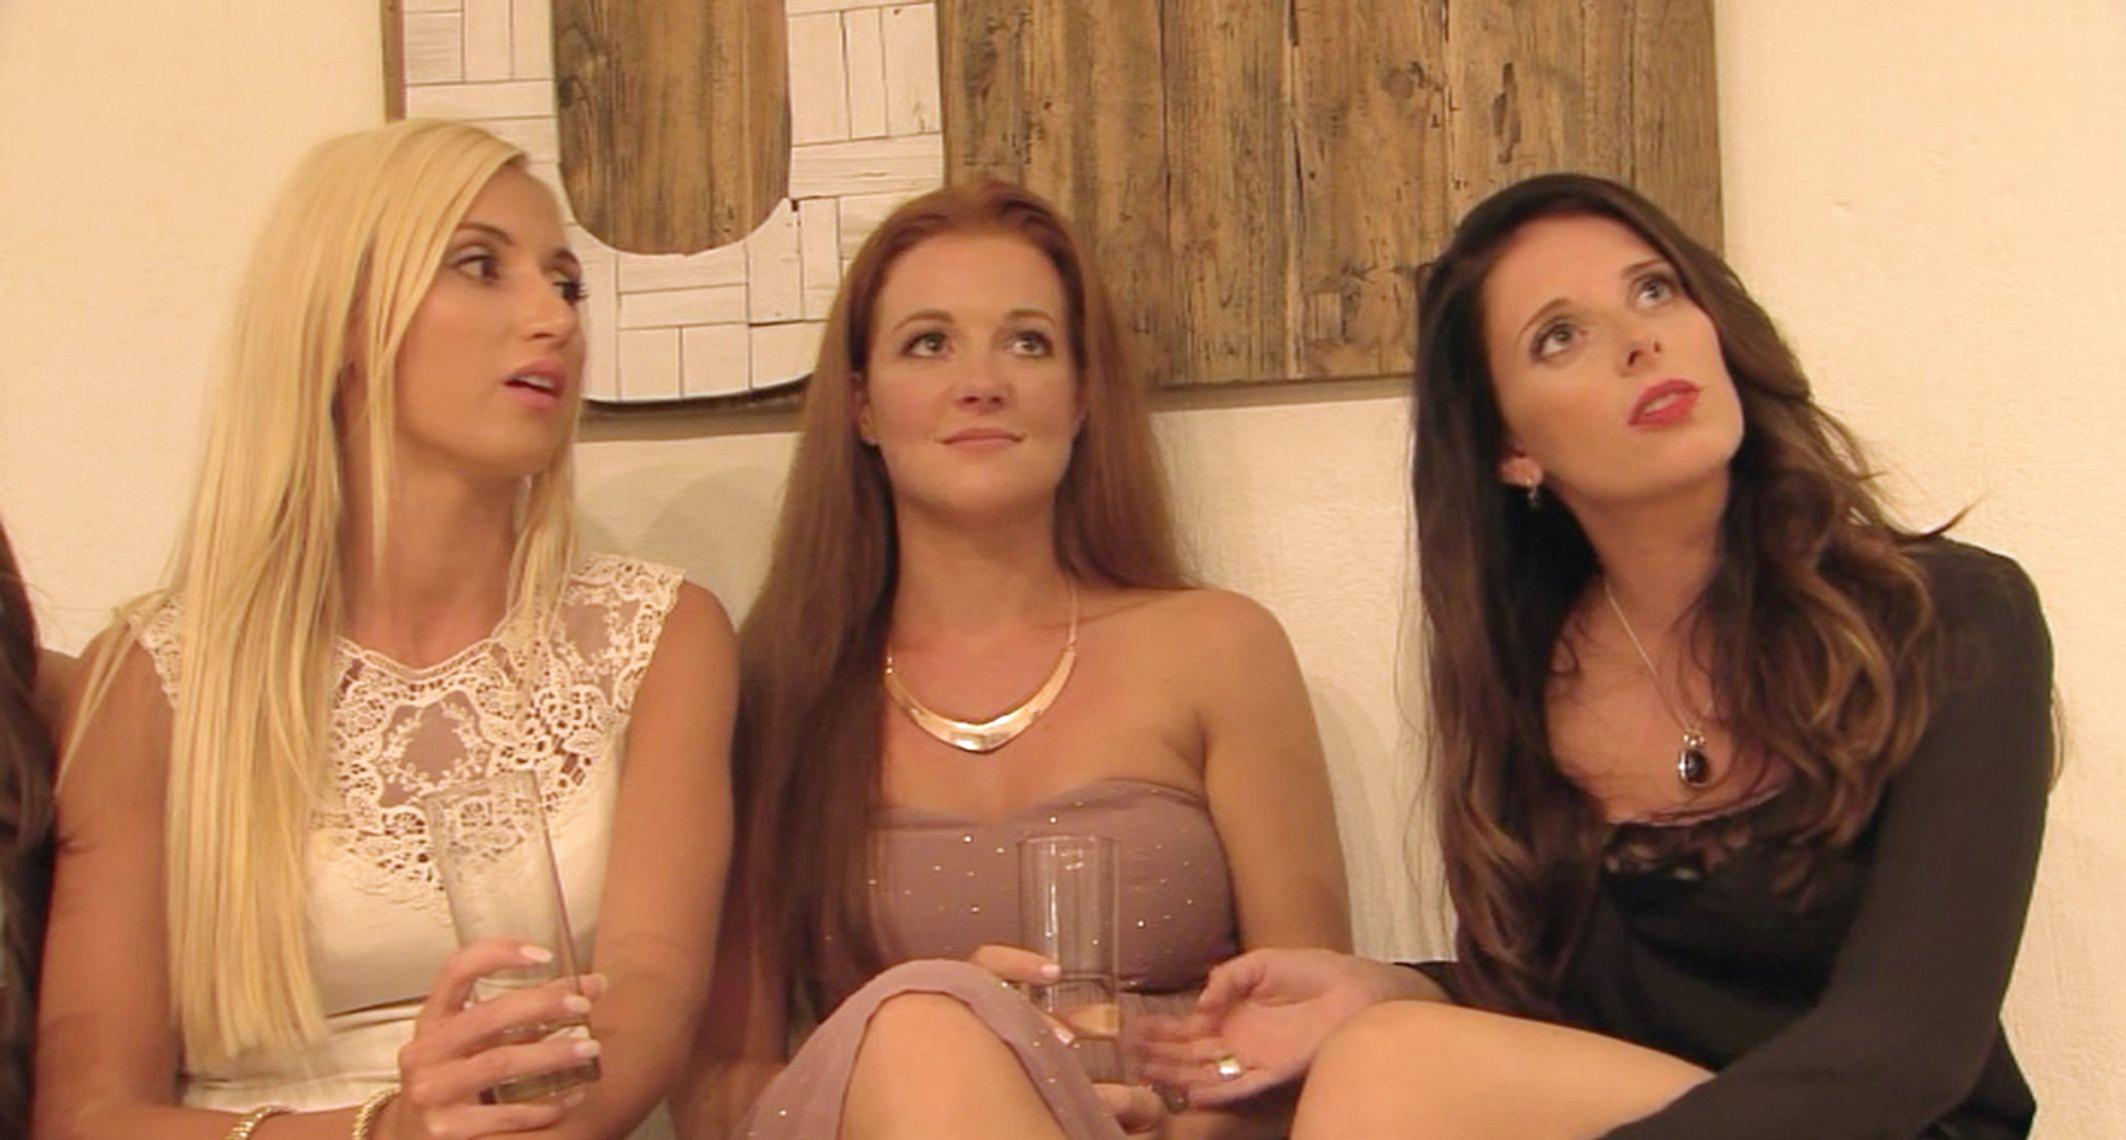 Der Bachelor 2014 - Folge 2 - Nadja, Angelina und Nena